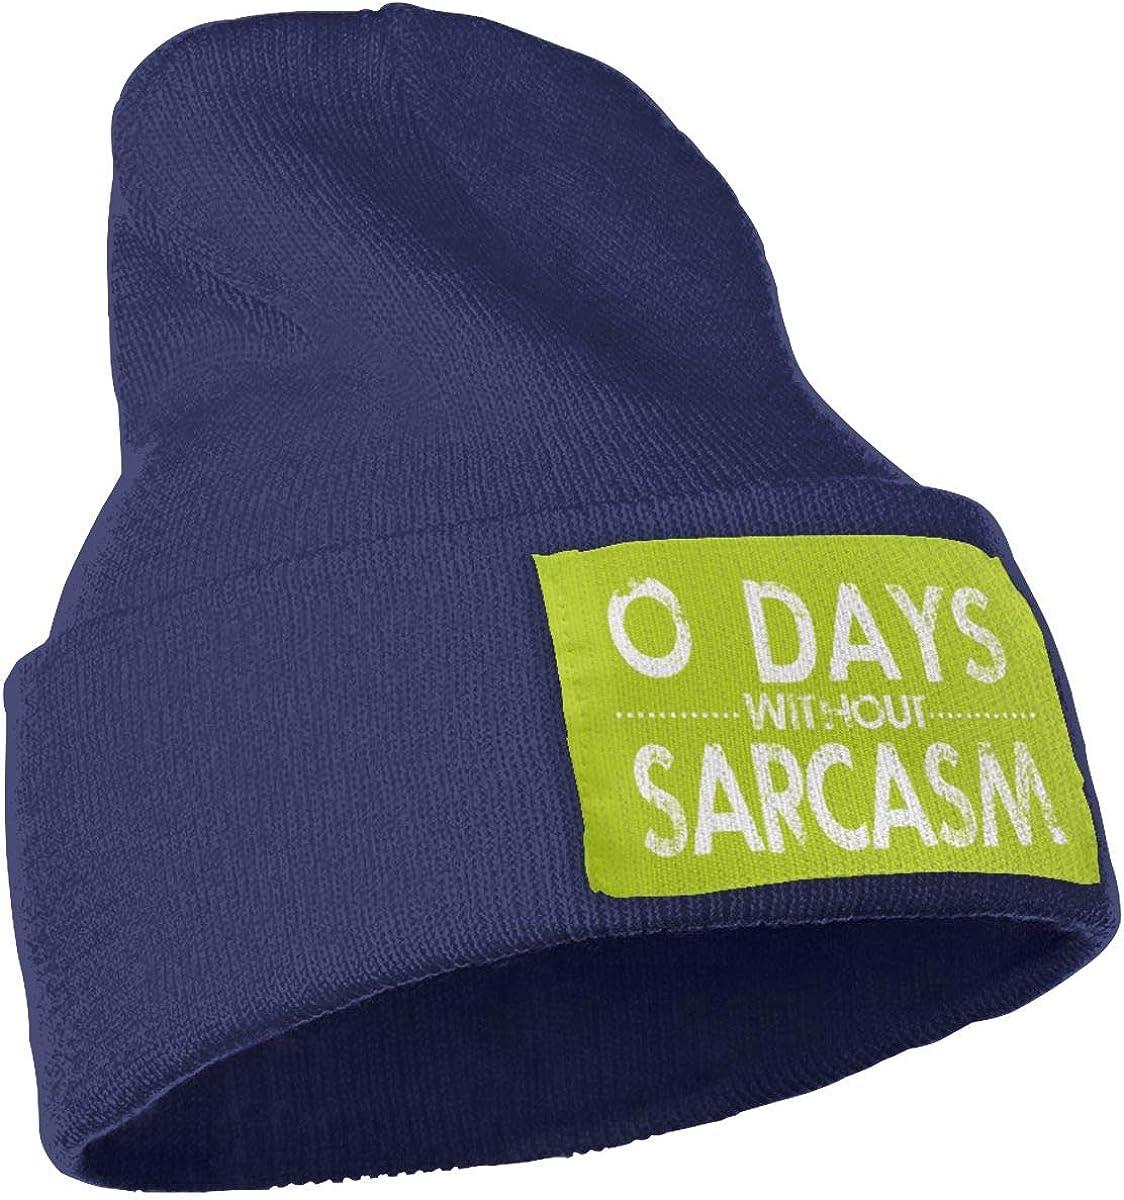 Oopp Jfhg Days Without Sarcasm 4 Wool Cap Beanie Cap Unisex Winter